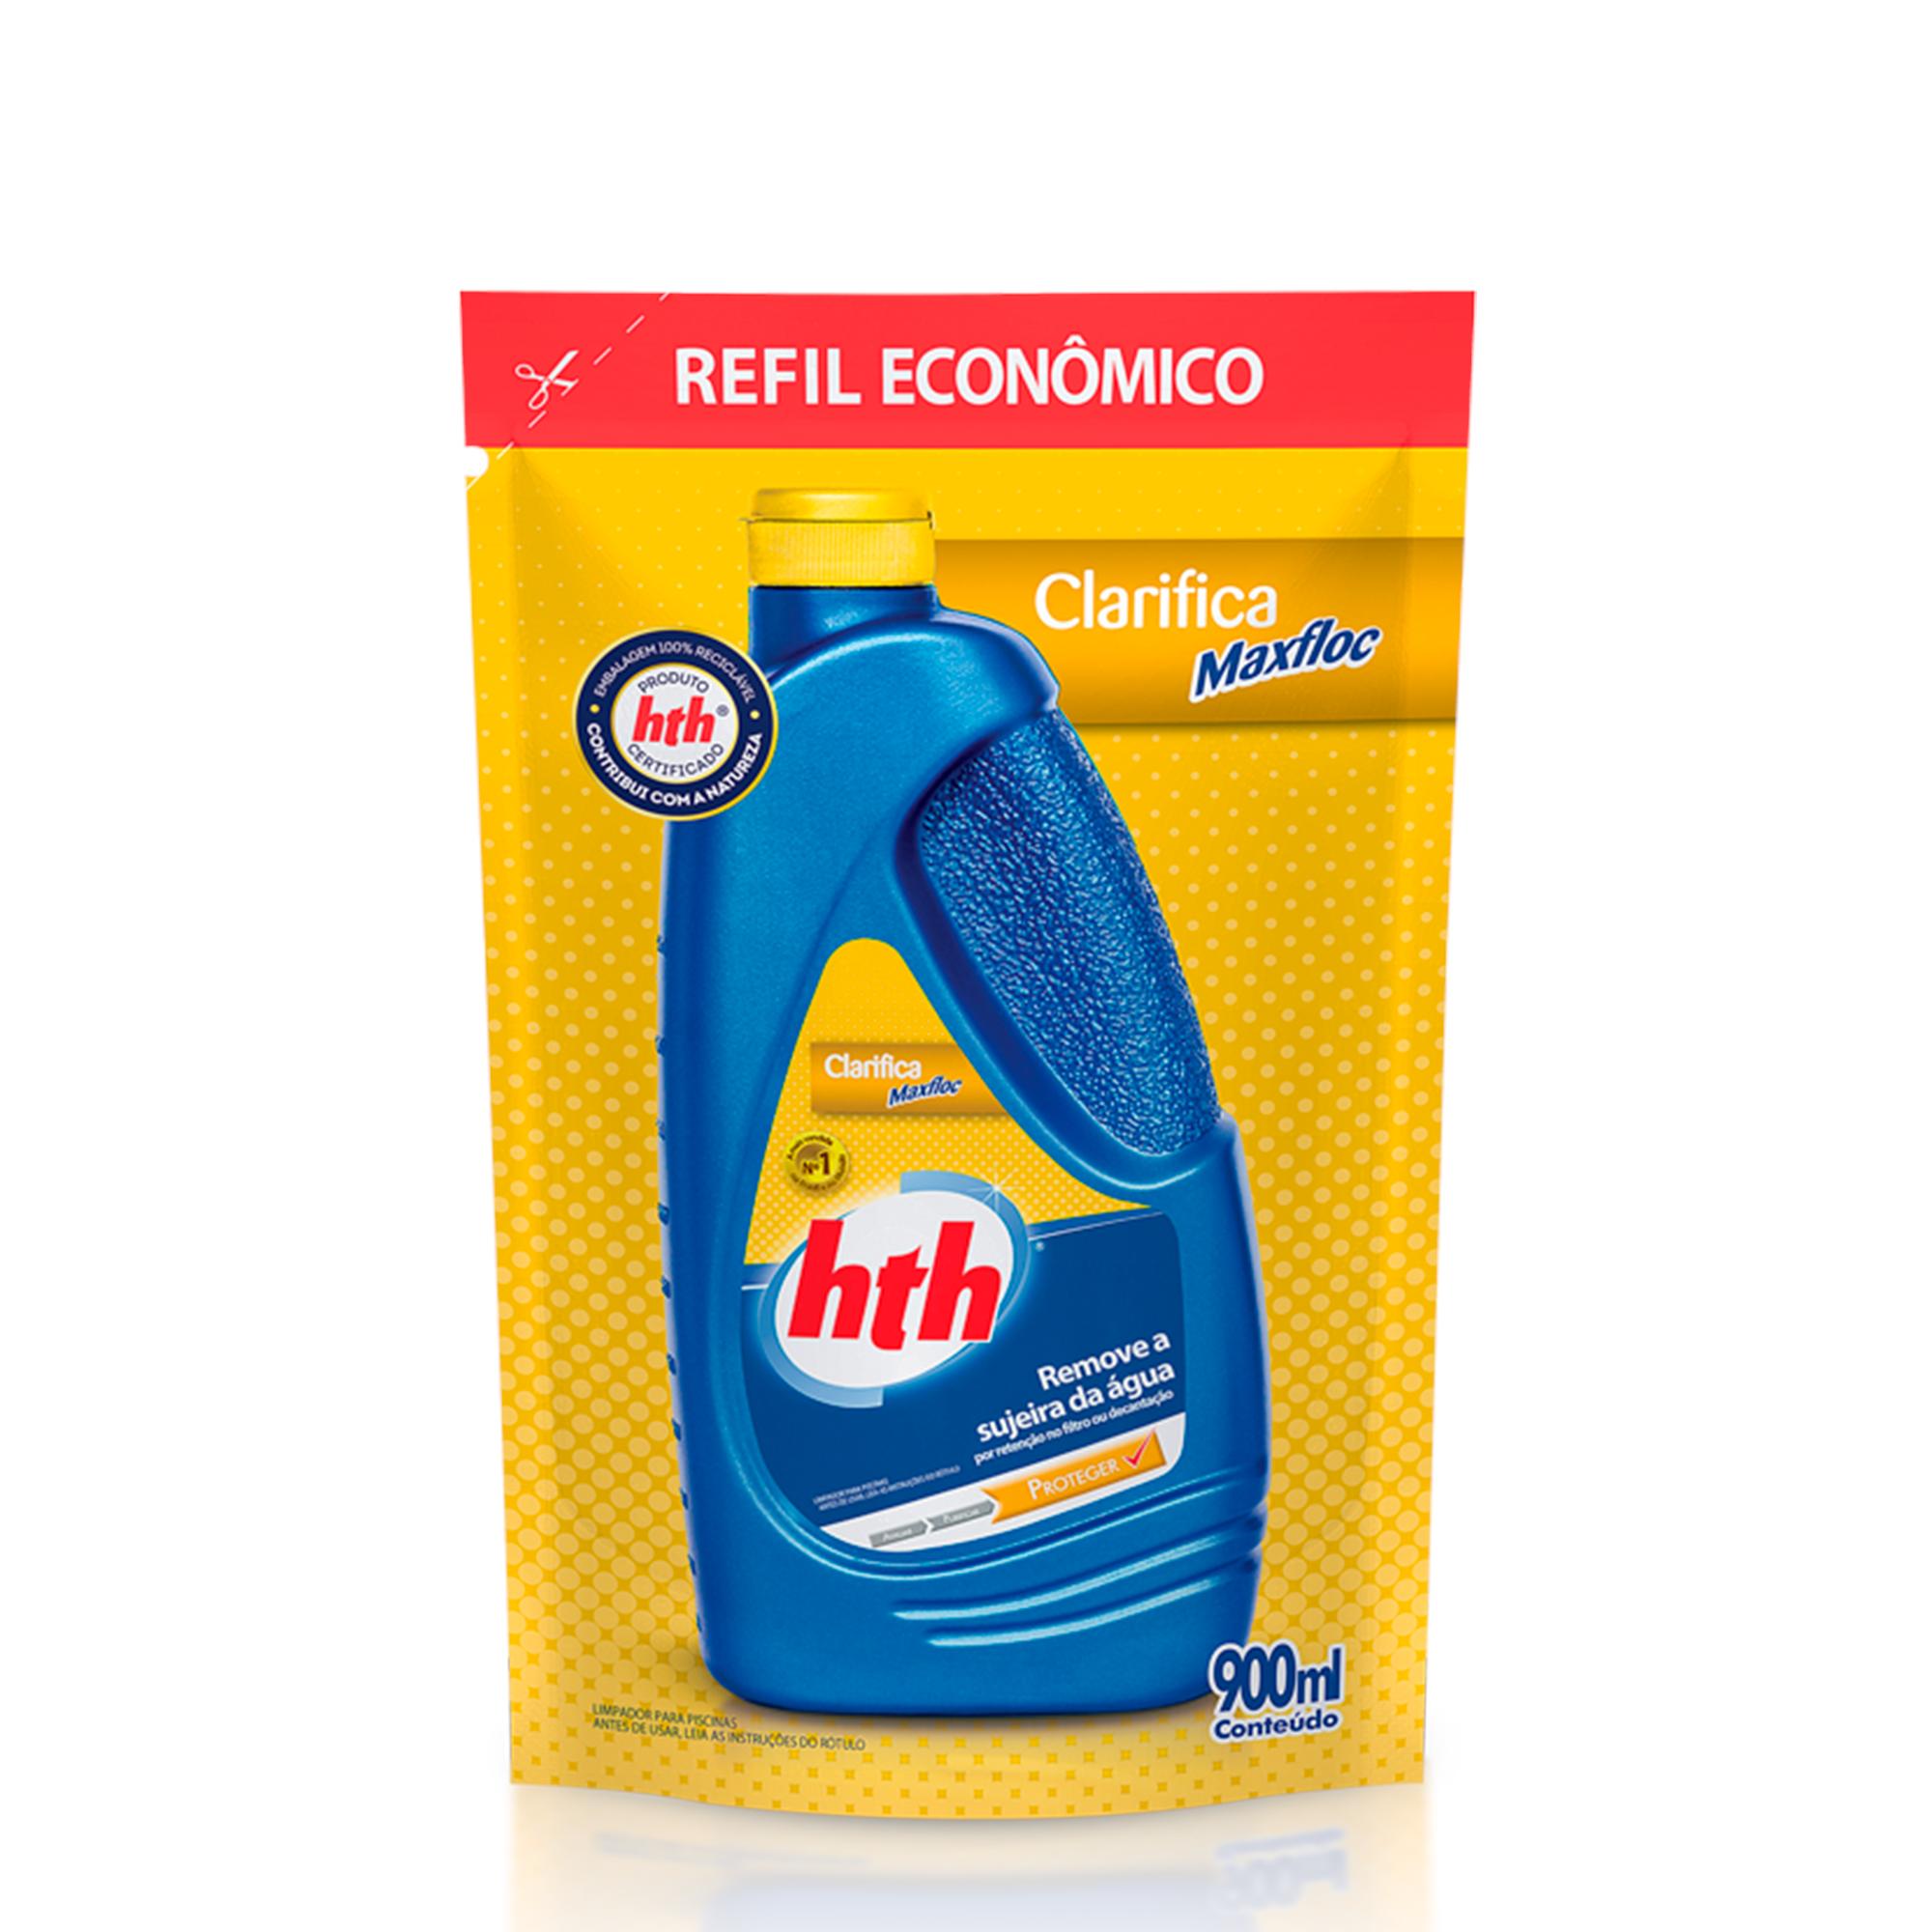 Refil Clarificante para Piscina Maxfloc 900ml Remove a Sujeira da Agua por Retencao no Filtro ou Decantacao - Hth